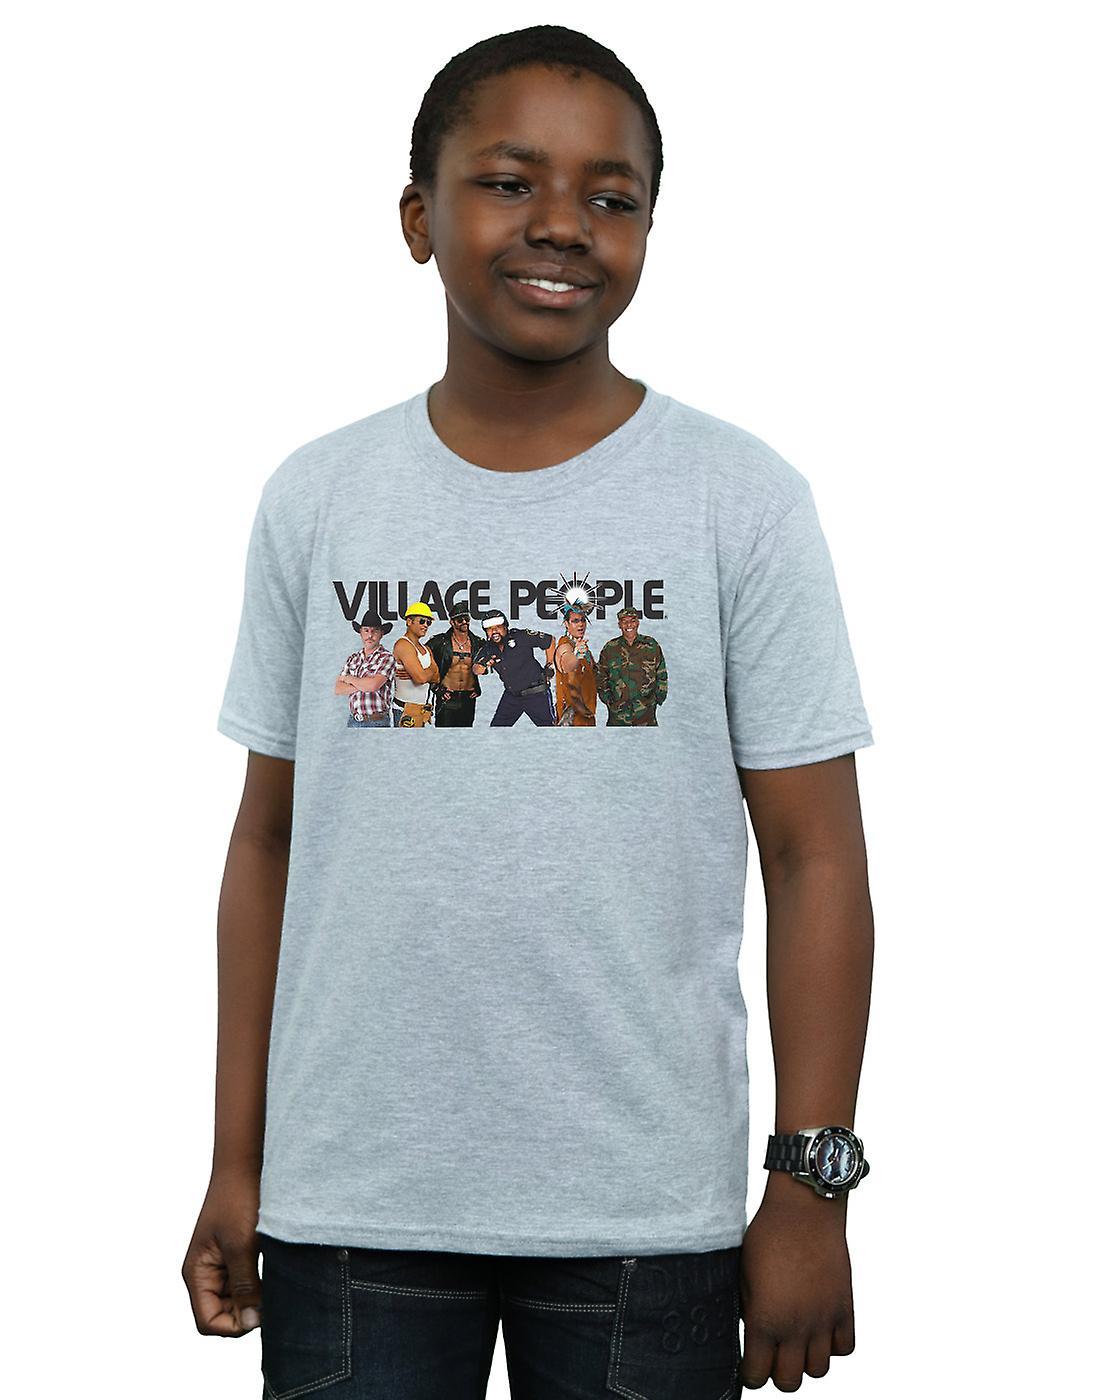 Village People Boys Group Photo T-Shirt